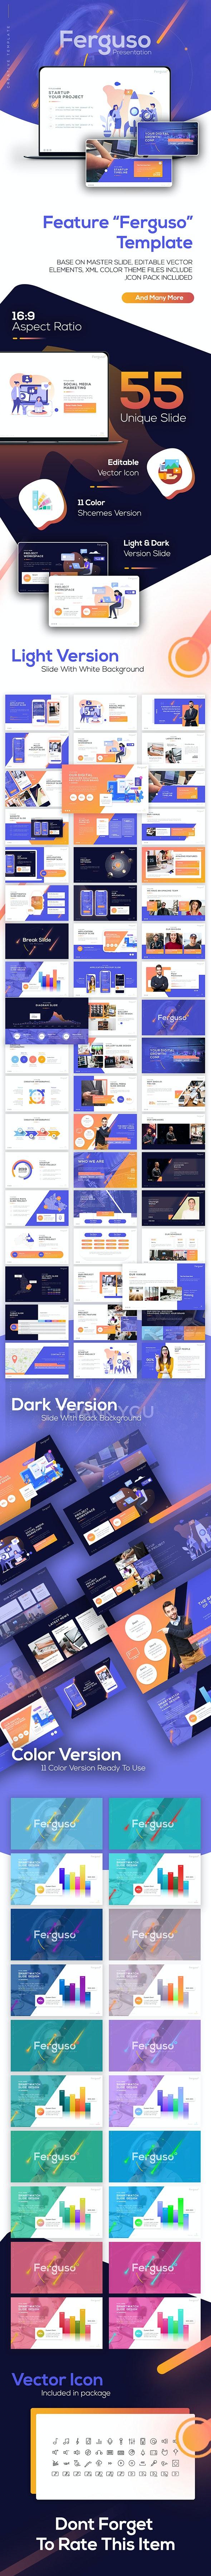 Ferguso - Creative PowerPoint Template - PowerPoint Templates Presentation Templates